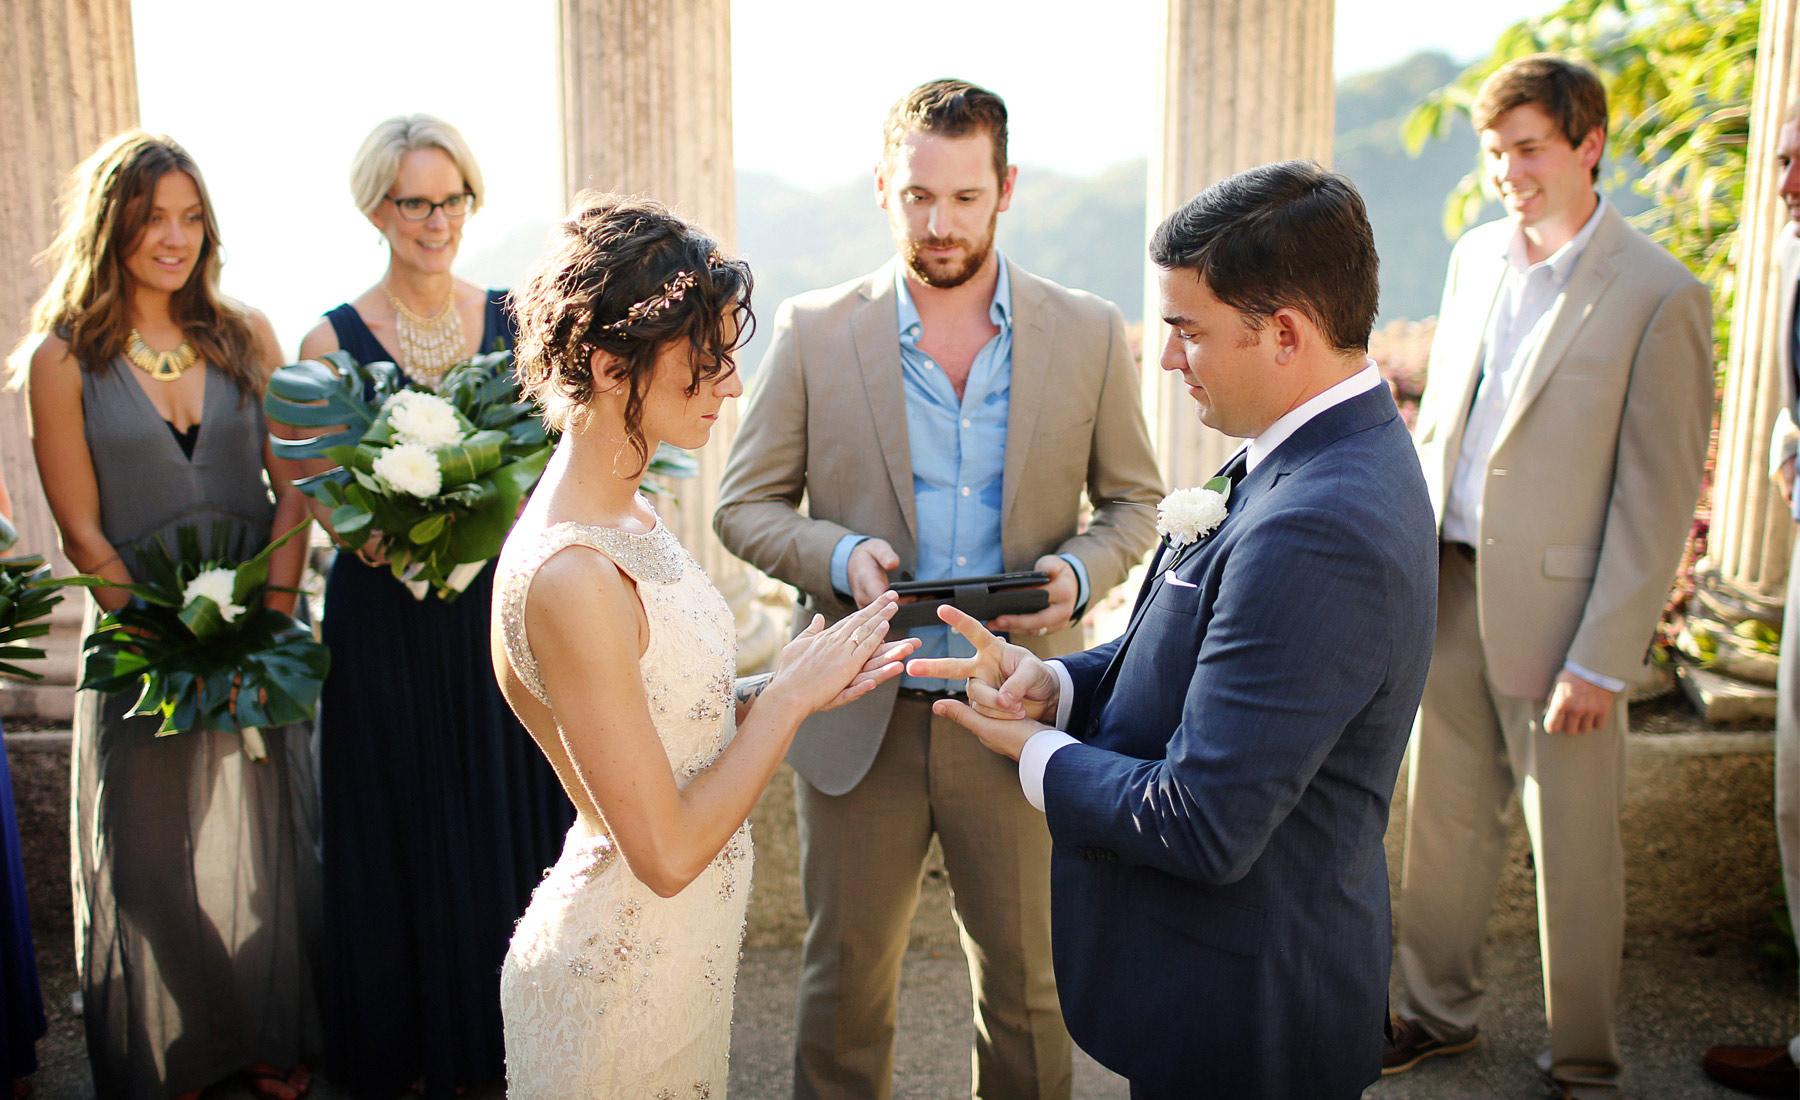 16-Costa-Rica-Wedding-Photography-by-Vick-Photography-Jaco-Island-Villa-Caletas-Resort-Ceremony-Outdoor-Jungle-View-Alli-and-Duncan.jpg